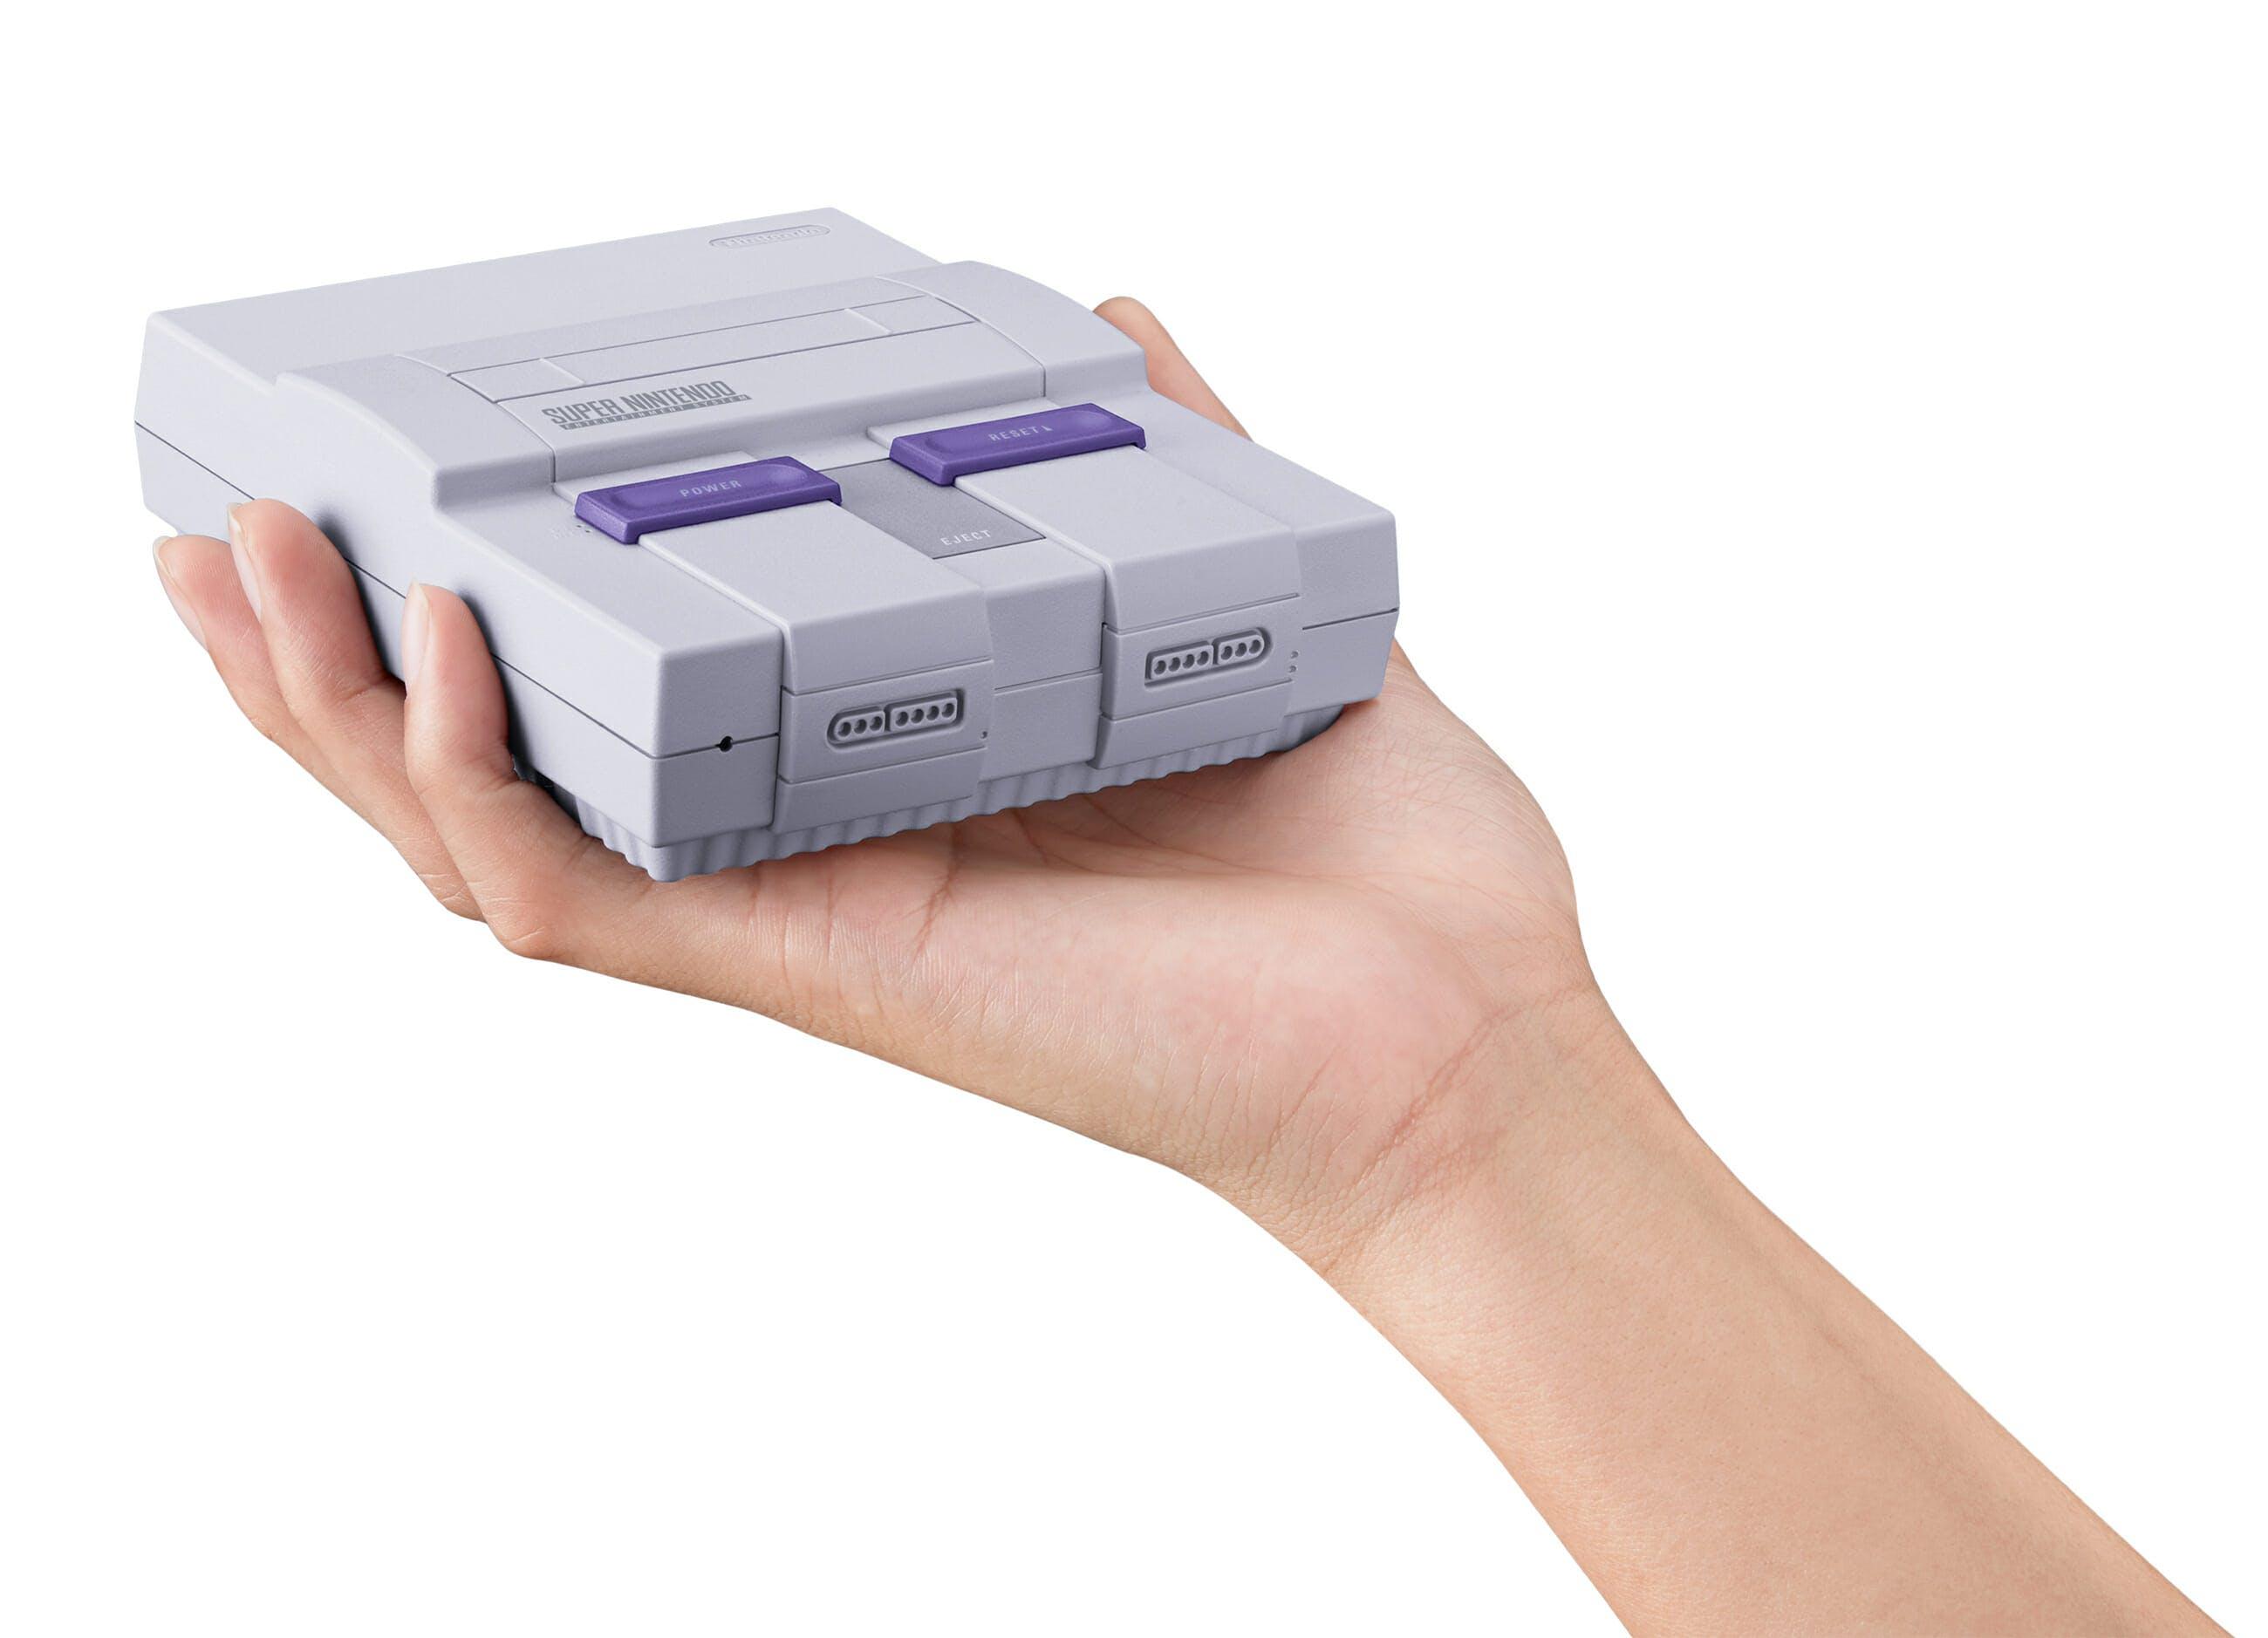 snes mini : Super Nintendo Entertainment System